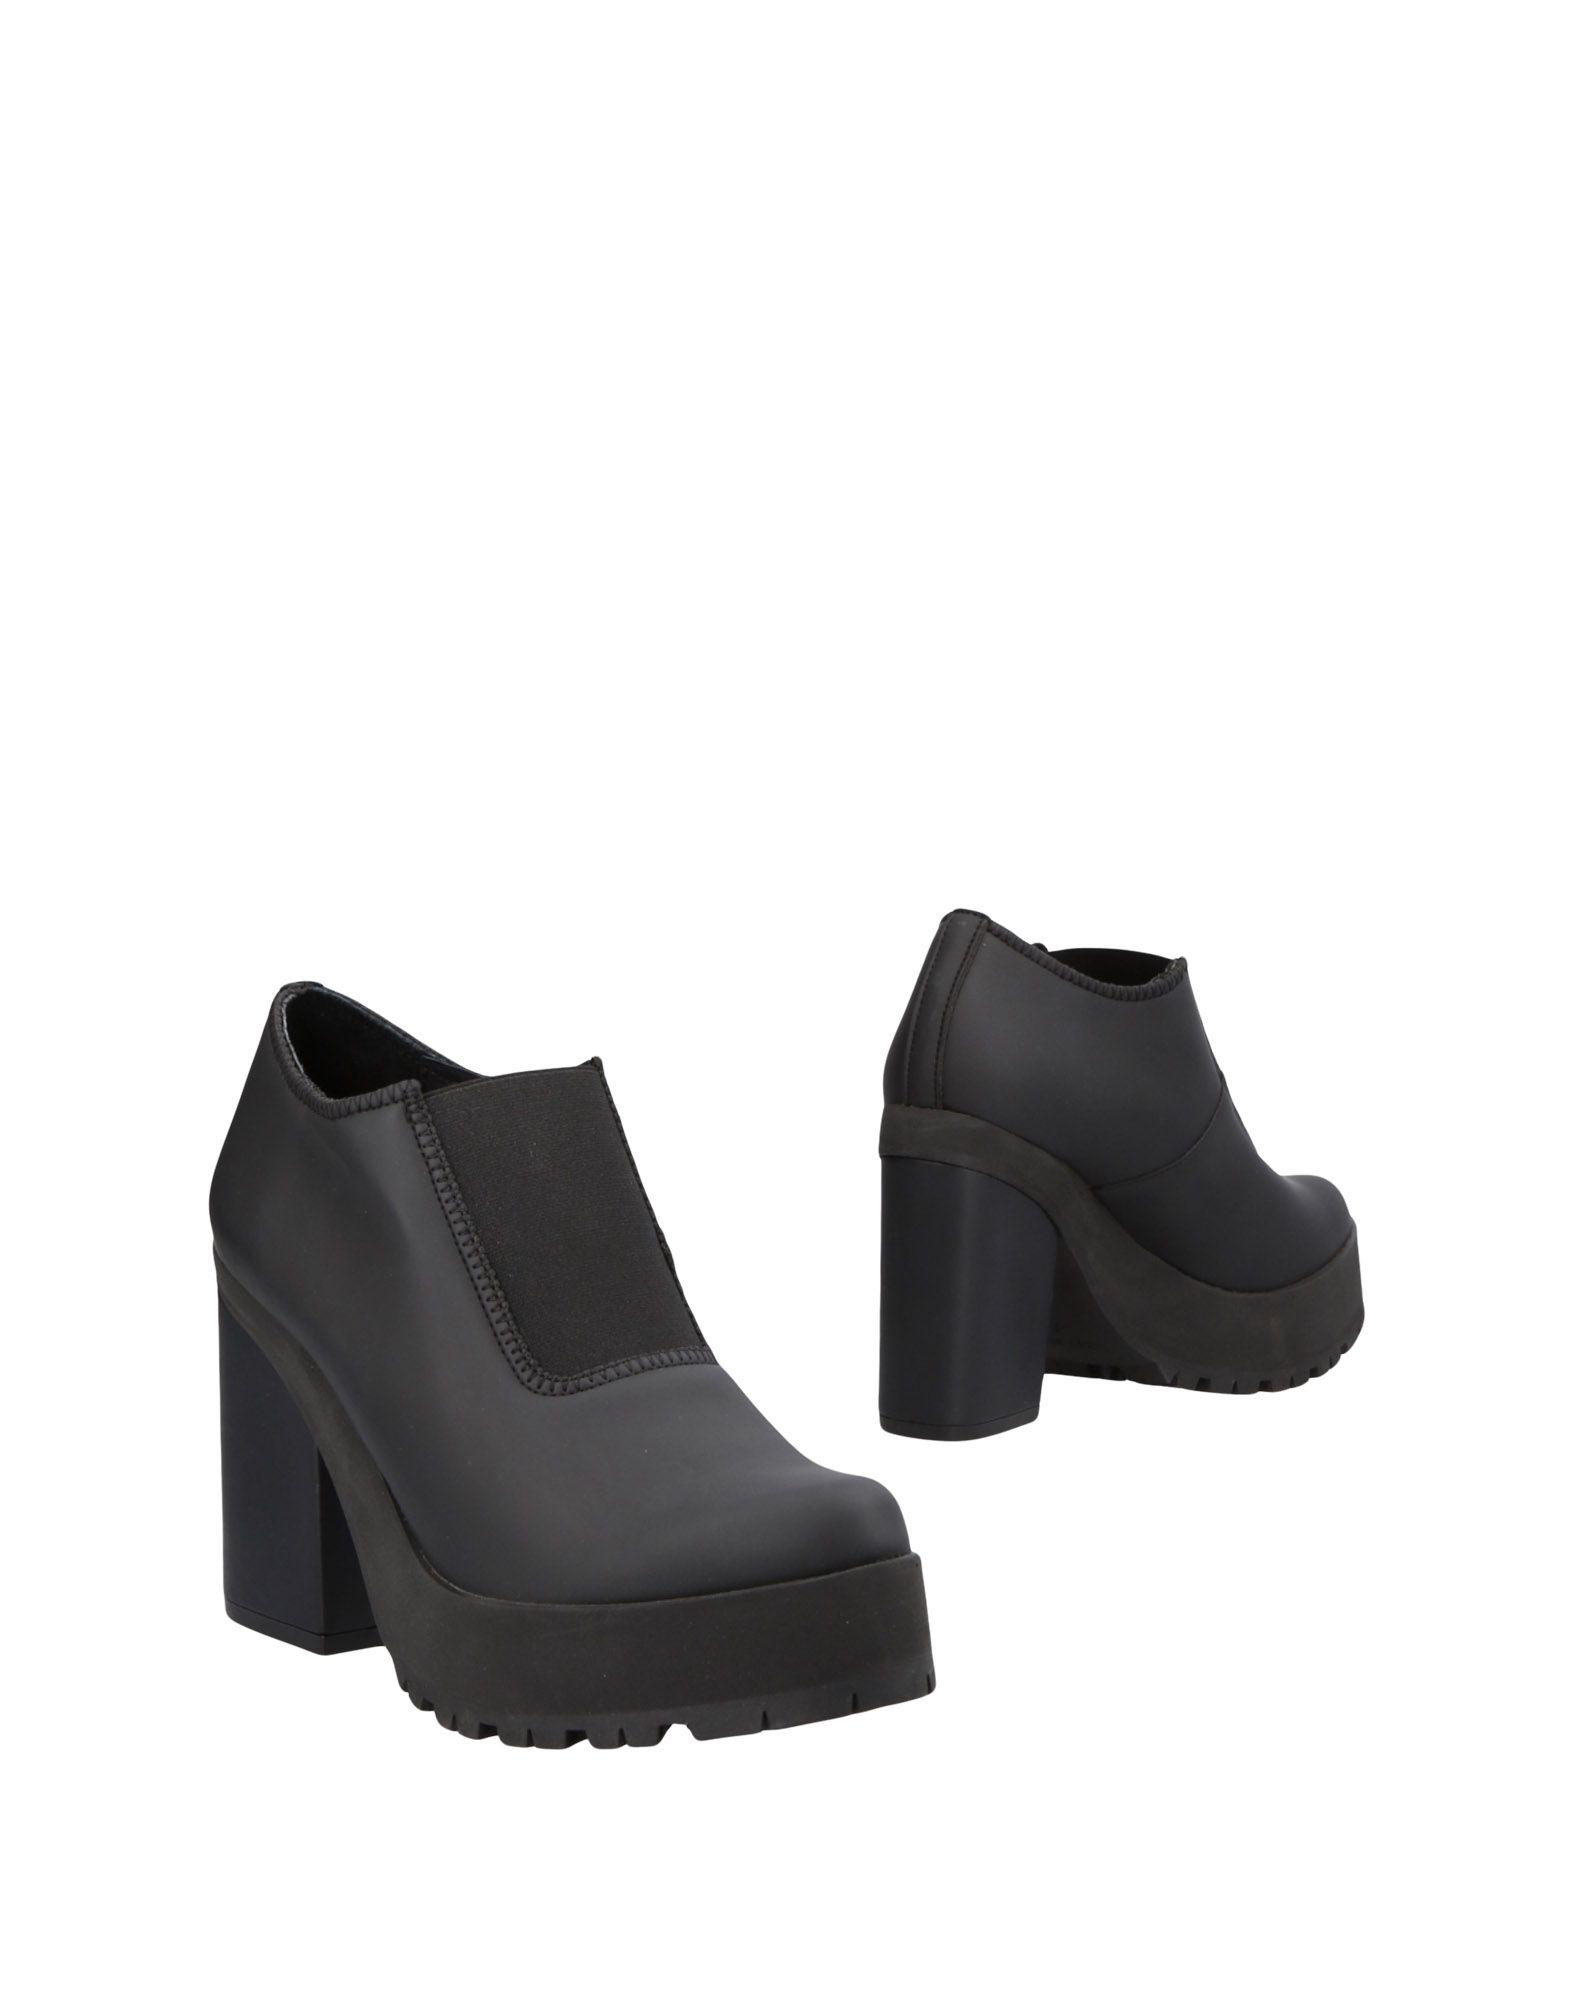 MIISTA Ankle Boot in Black